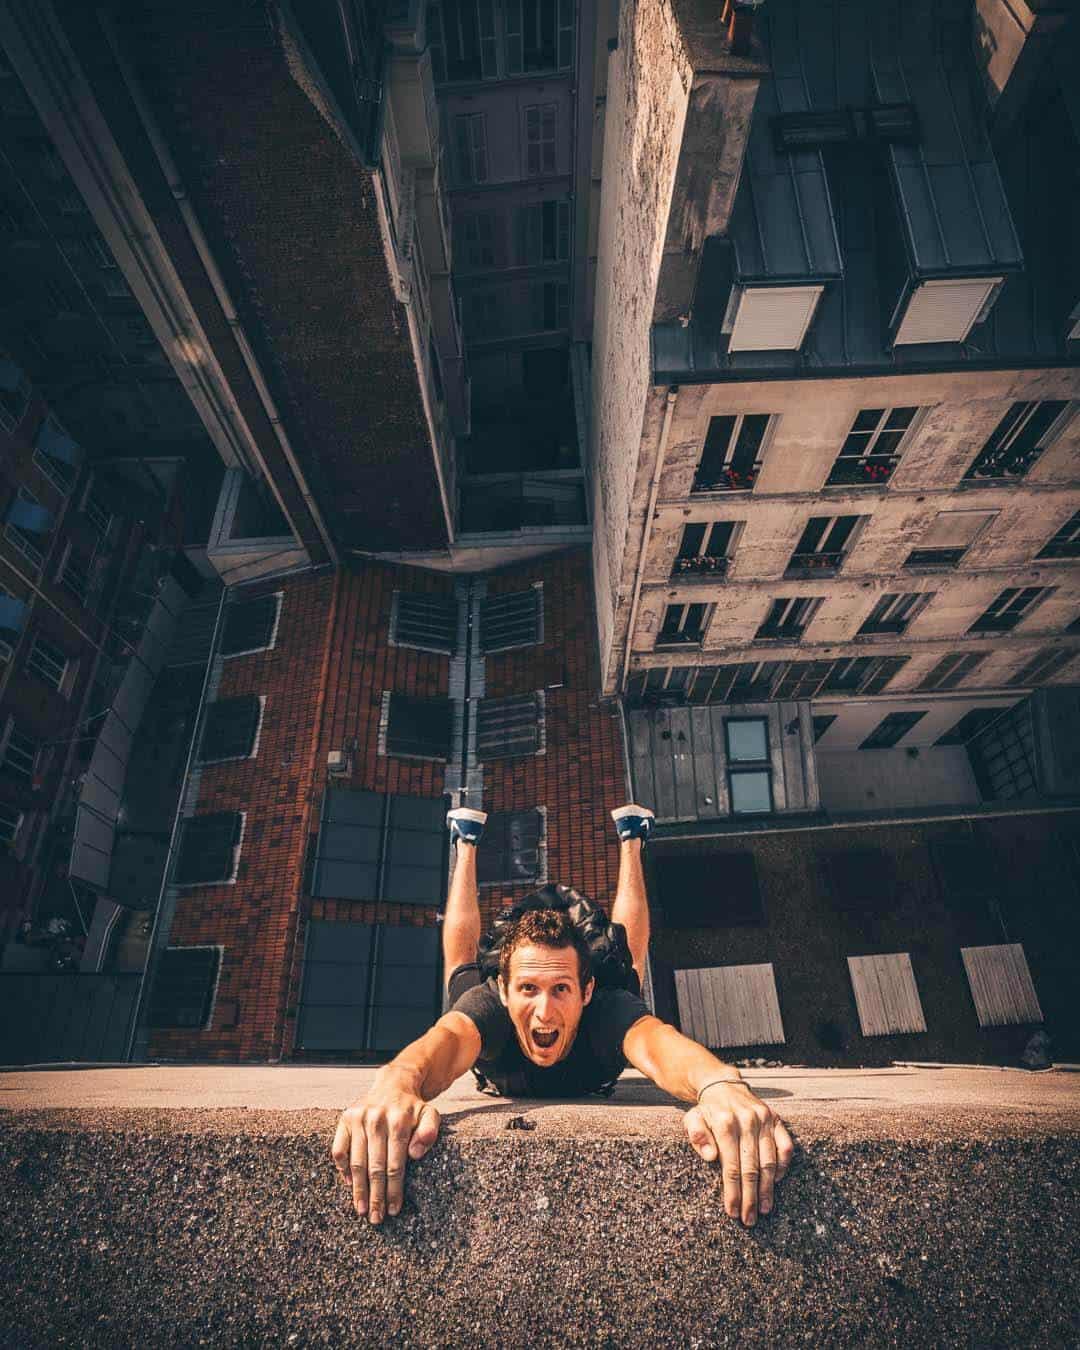 etrefort thibaut parkour clothing outdor paris rooftop pov helo